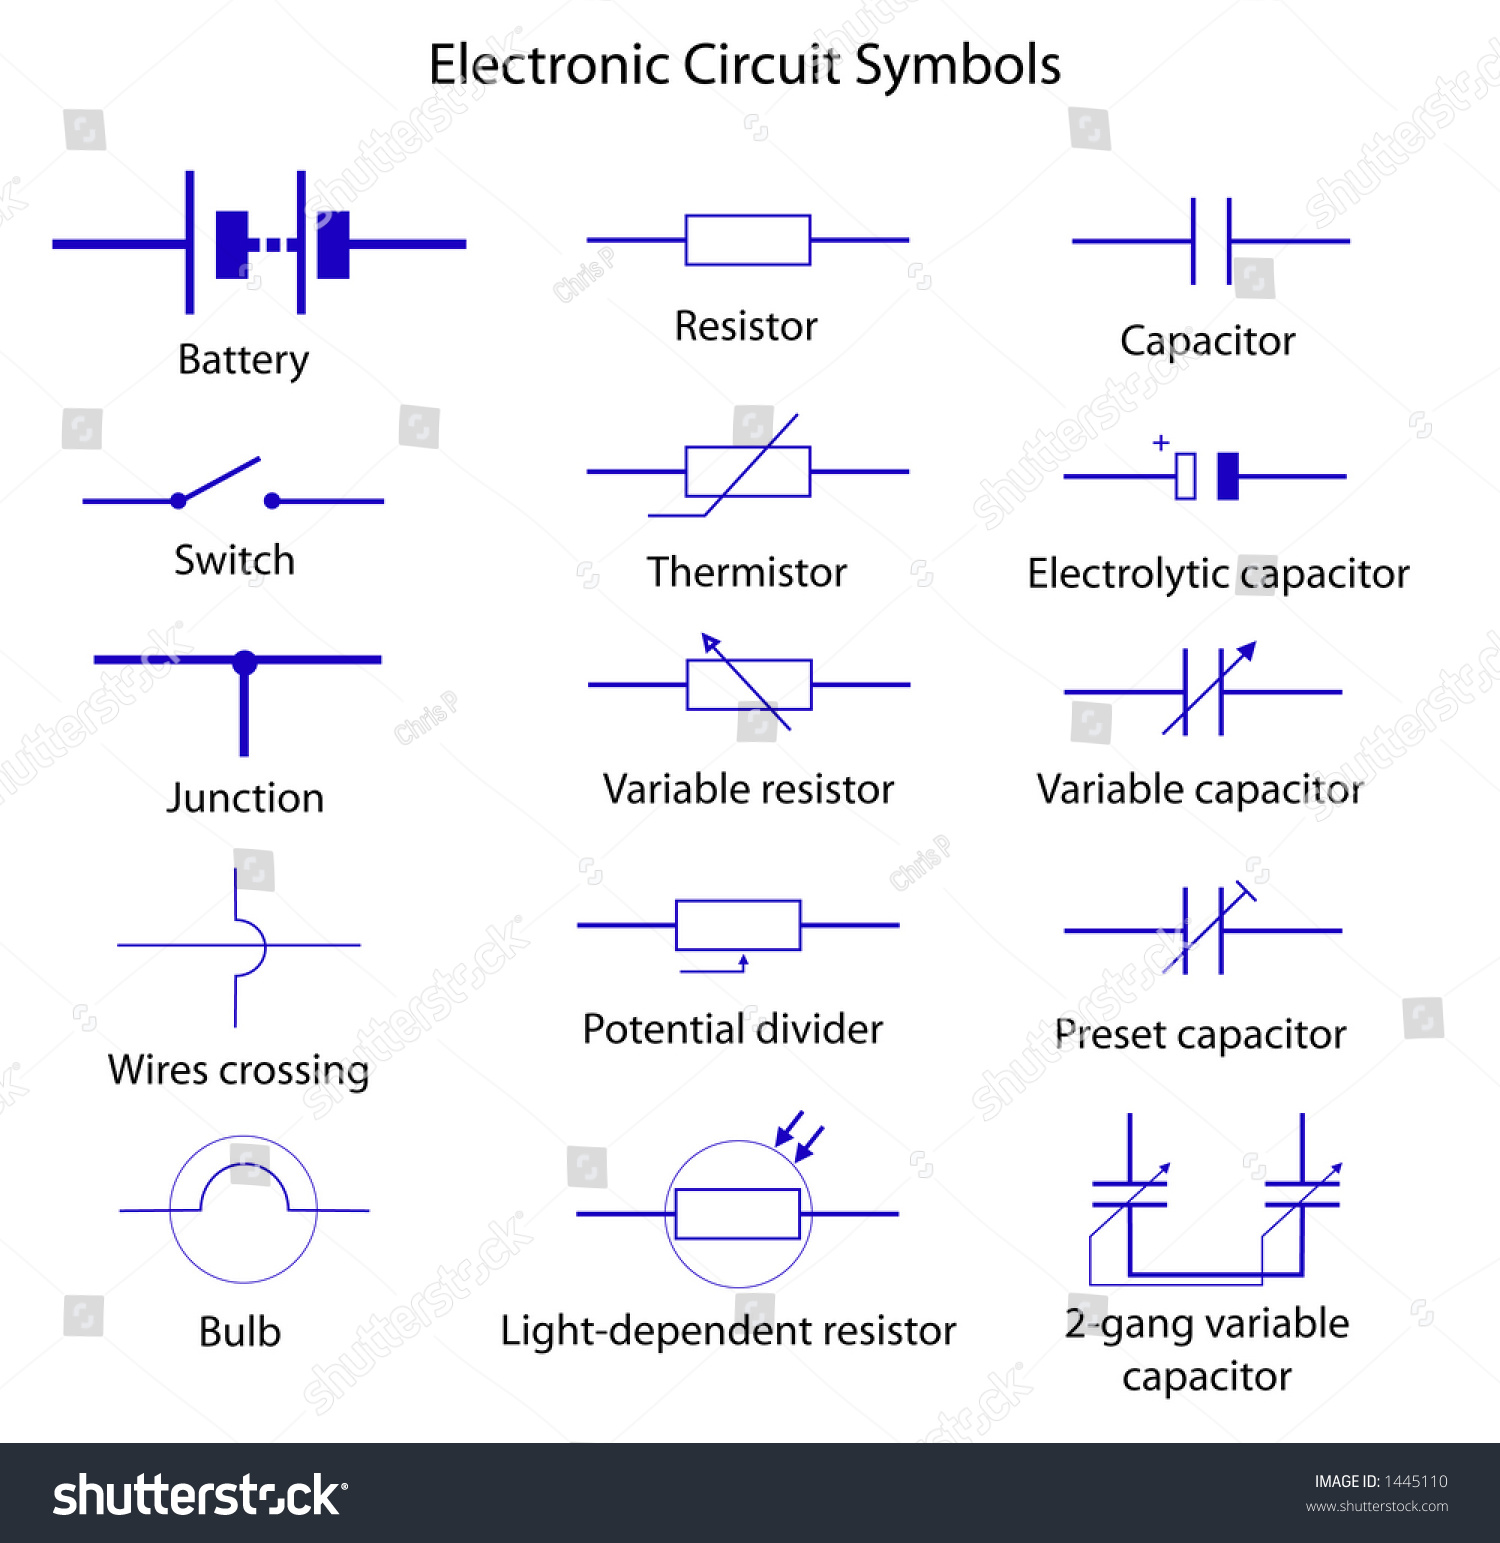 electronic circuit symbols stock vector 1445110 shutterstock. Black Bedroom Furniture Sets. Home Design Ideas